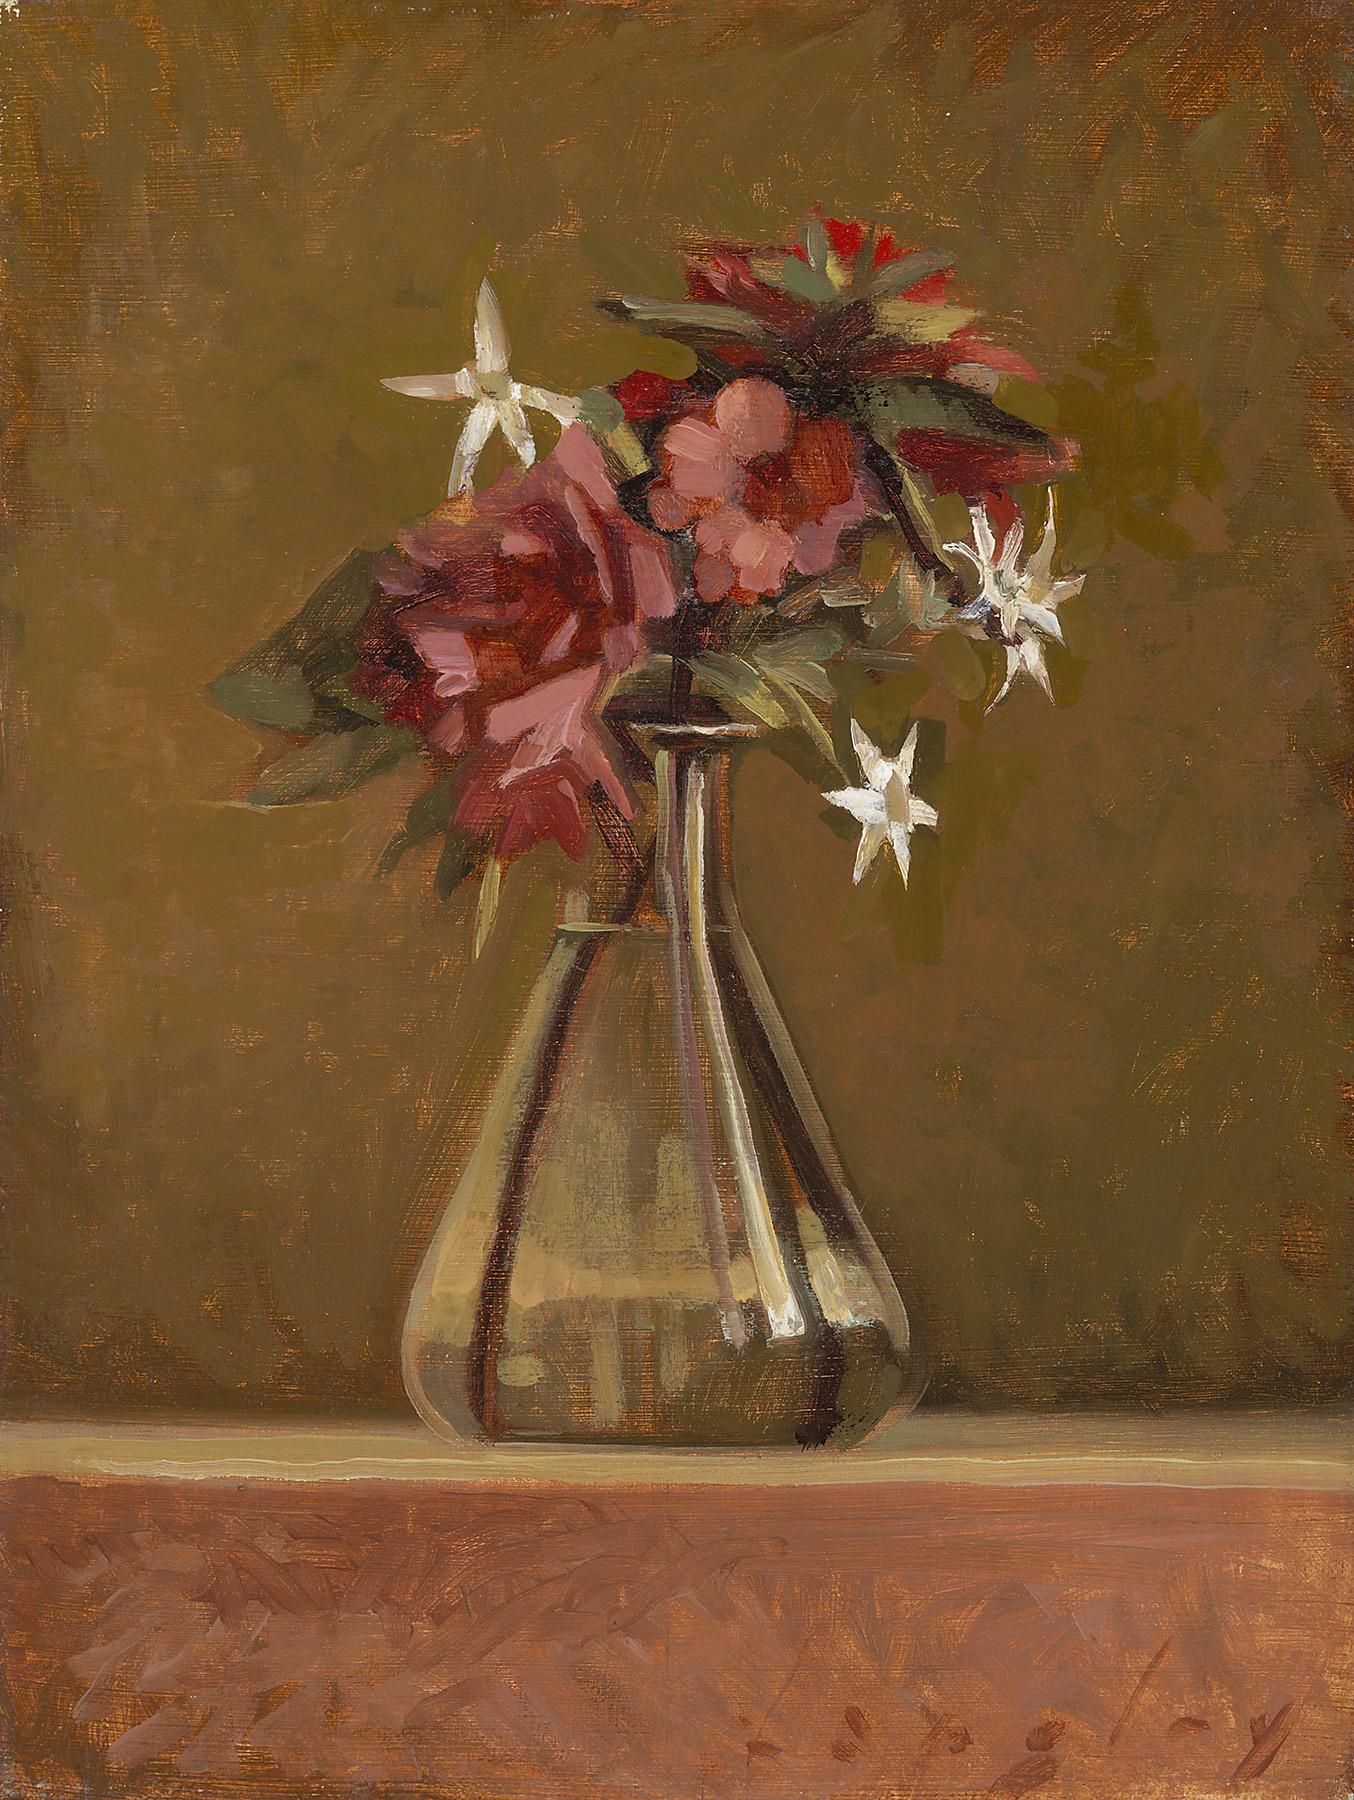 langley-fiori-stellae.jpg